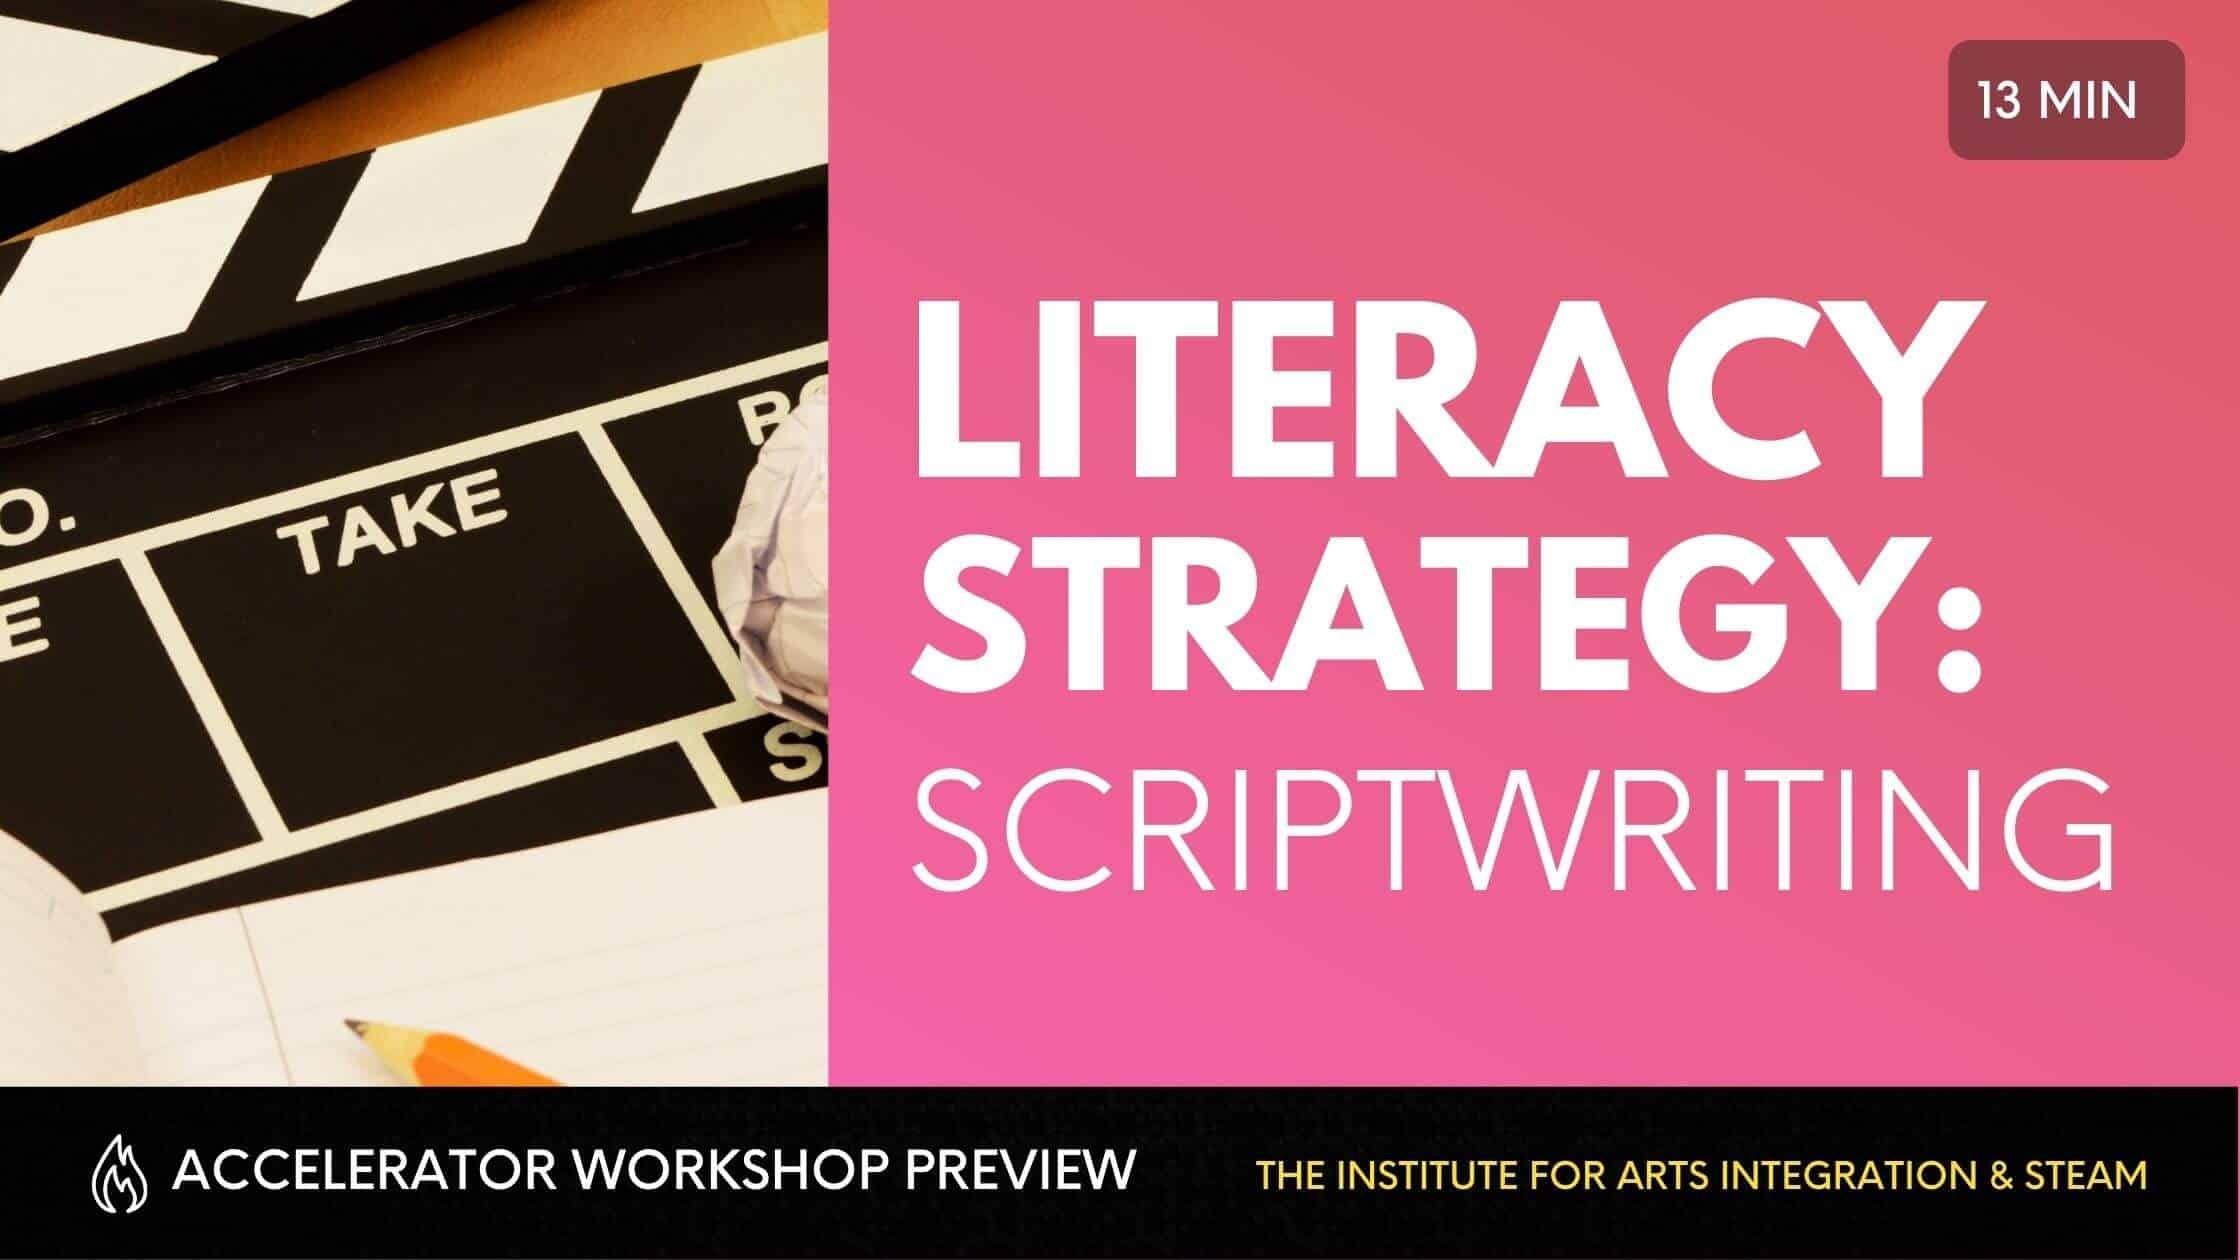 LITERACY STRATEGIES SCRIPTWRITING